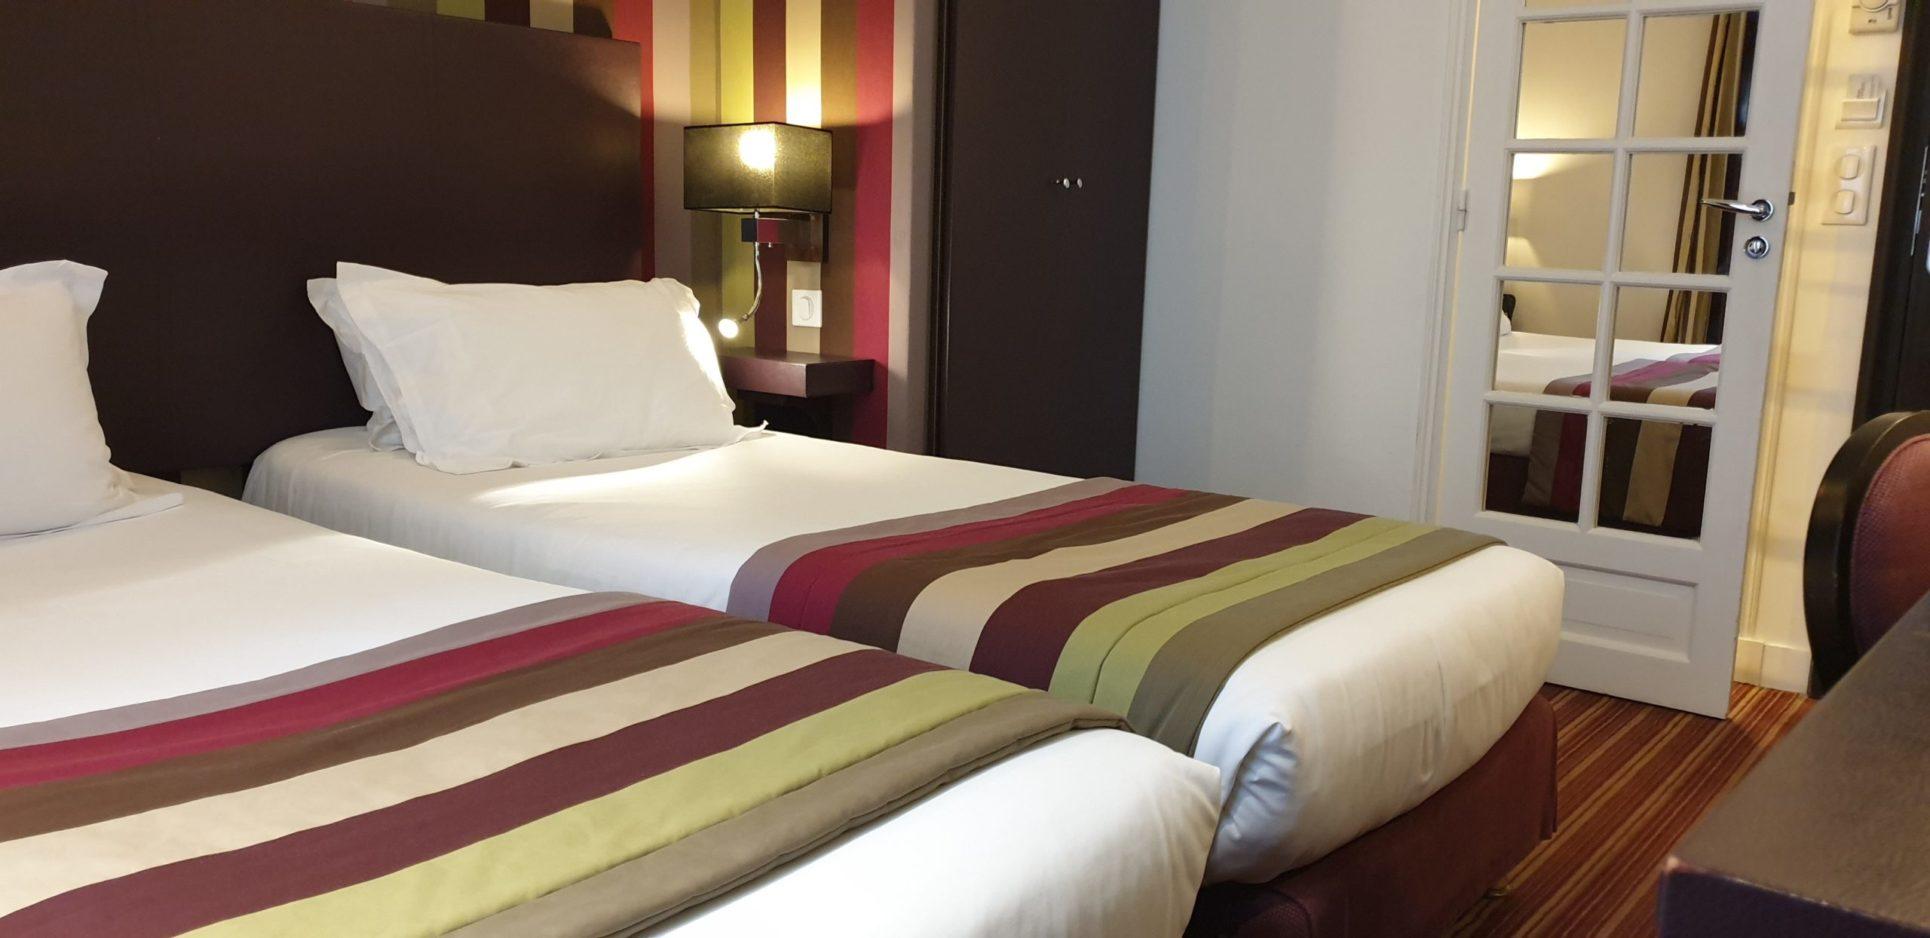 chambre twin rayures 8 - hôtel star champs-élysées